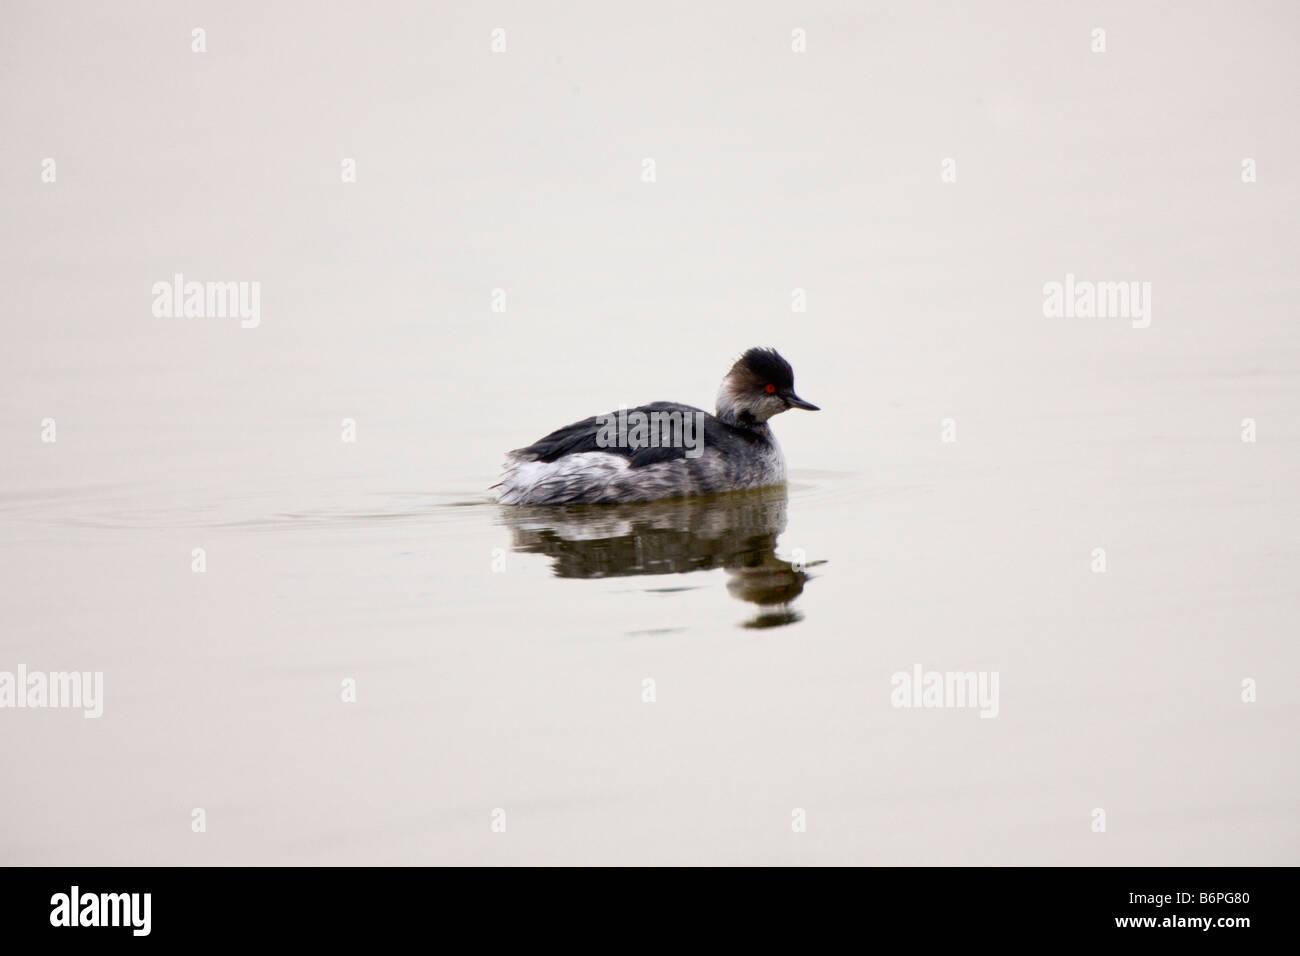 Black-necked Grebe Swimming, Walvis Bay, Namibia - Stock Image